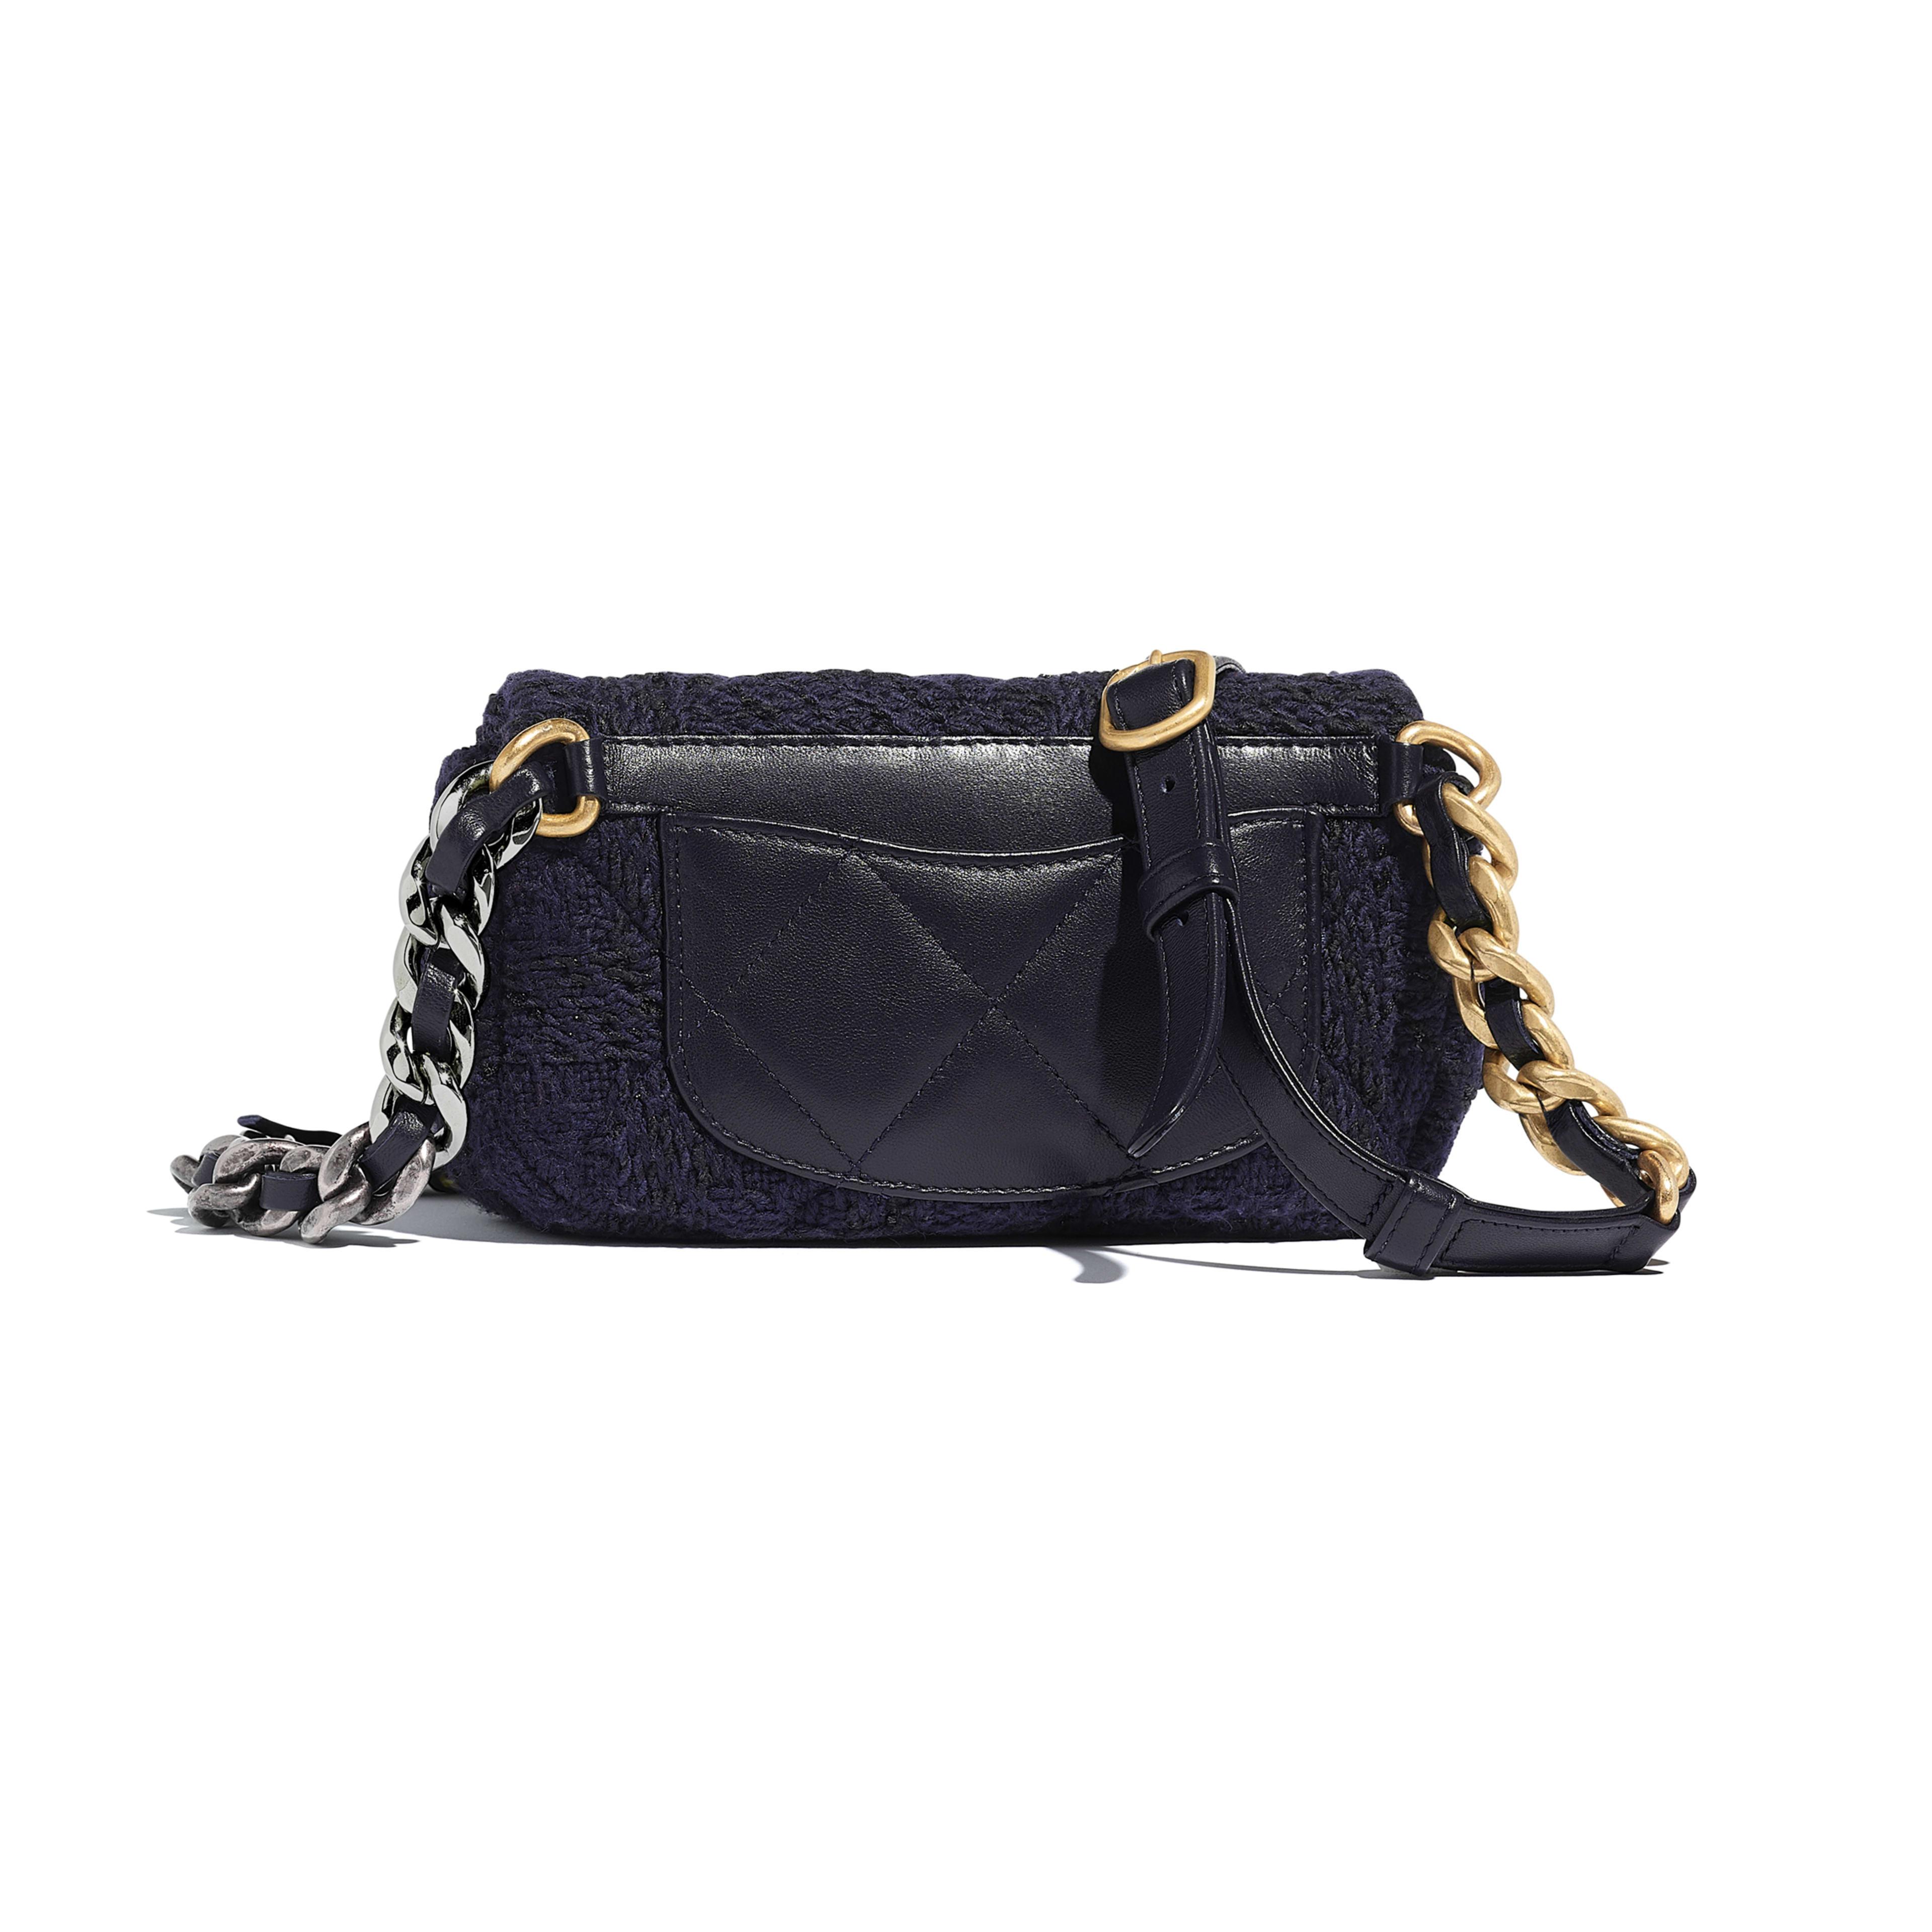 CHANEL 19 Waist Bag - Navy Blue & Black - Wool Tweed, Gold-Tone, Silver-Tone & Ruthenium-Finish Metal - Alternative view - see full sized version